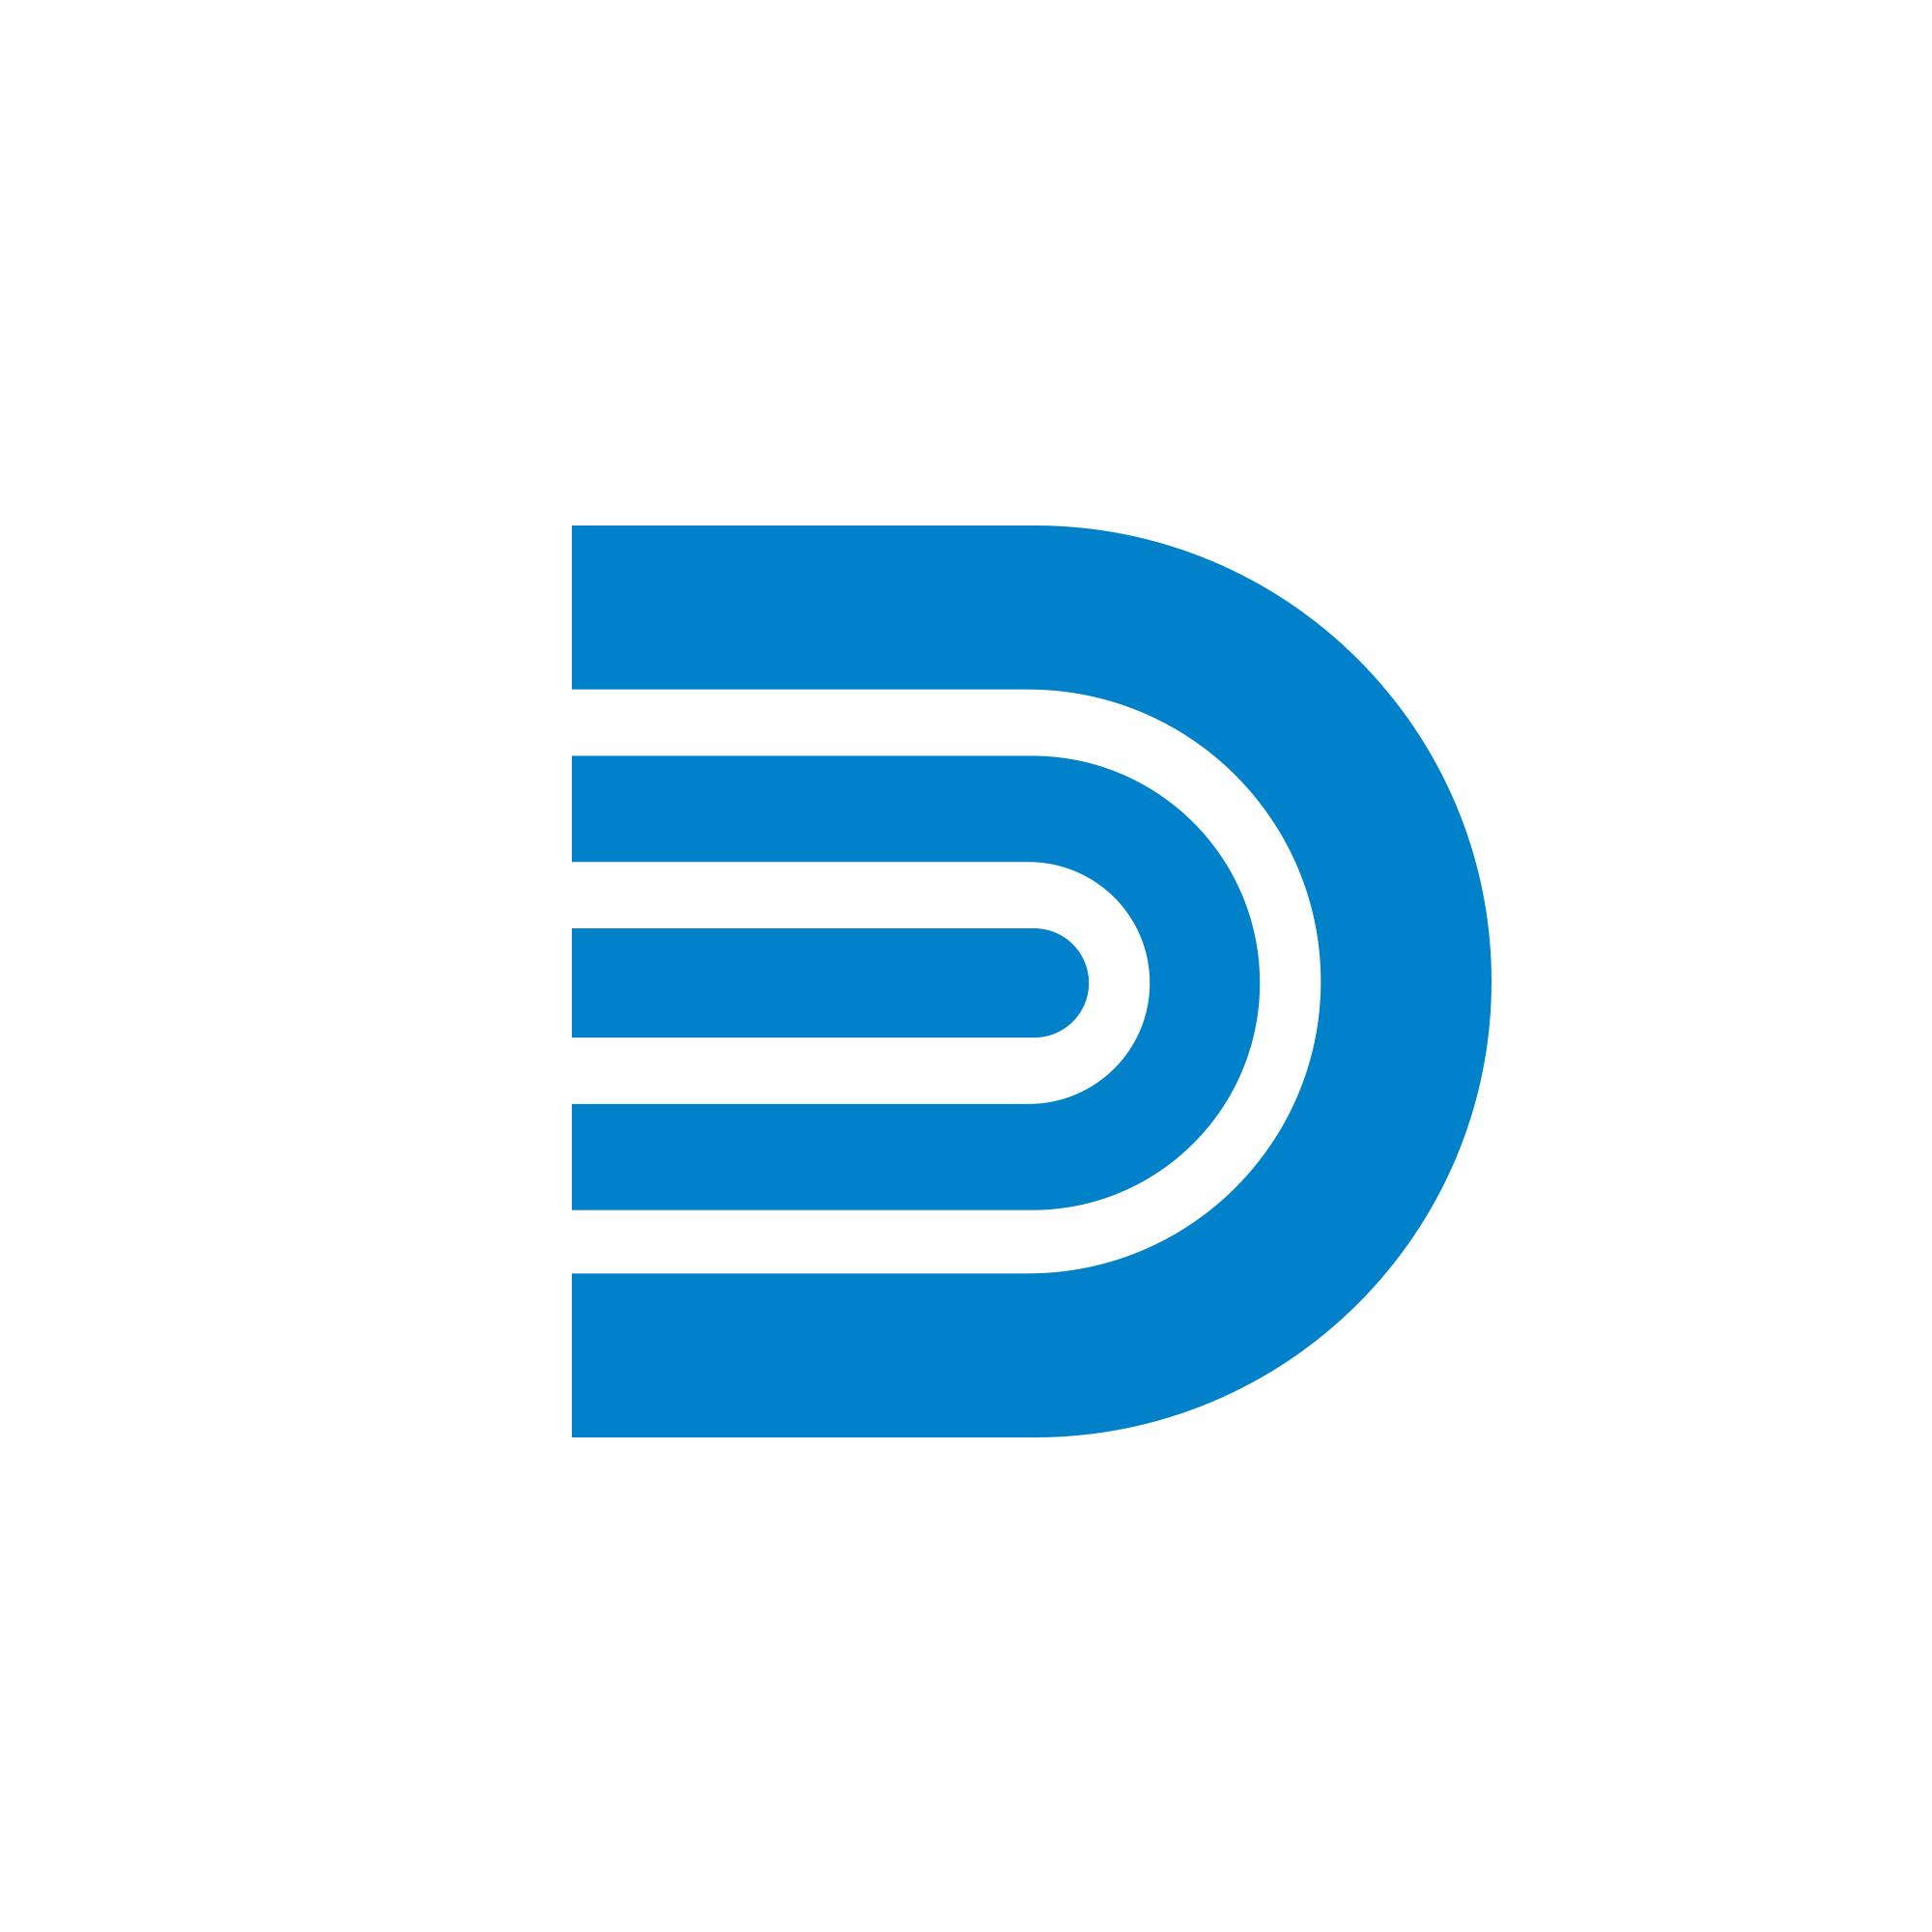 Ducommun AeroStructures logo